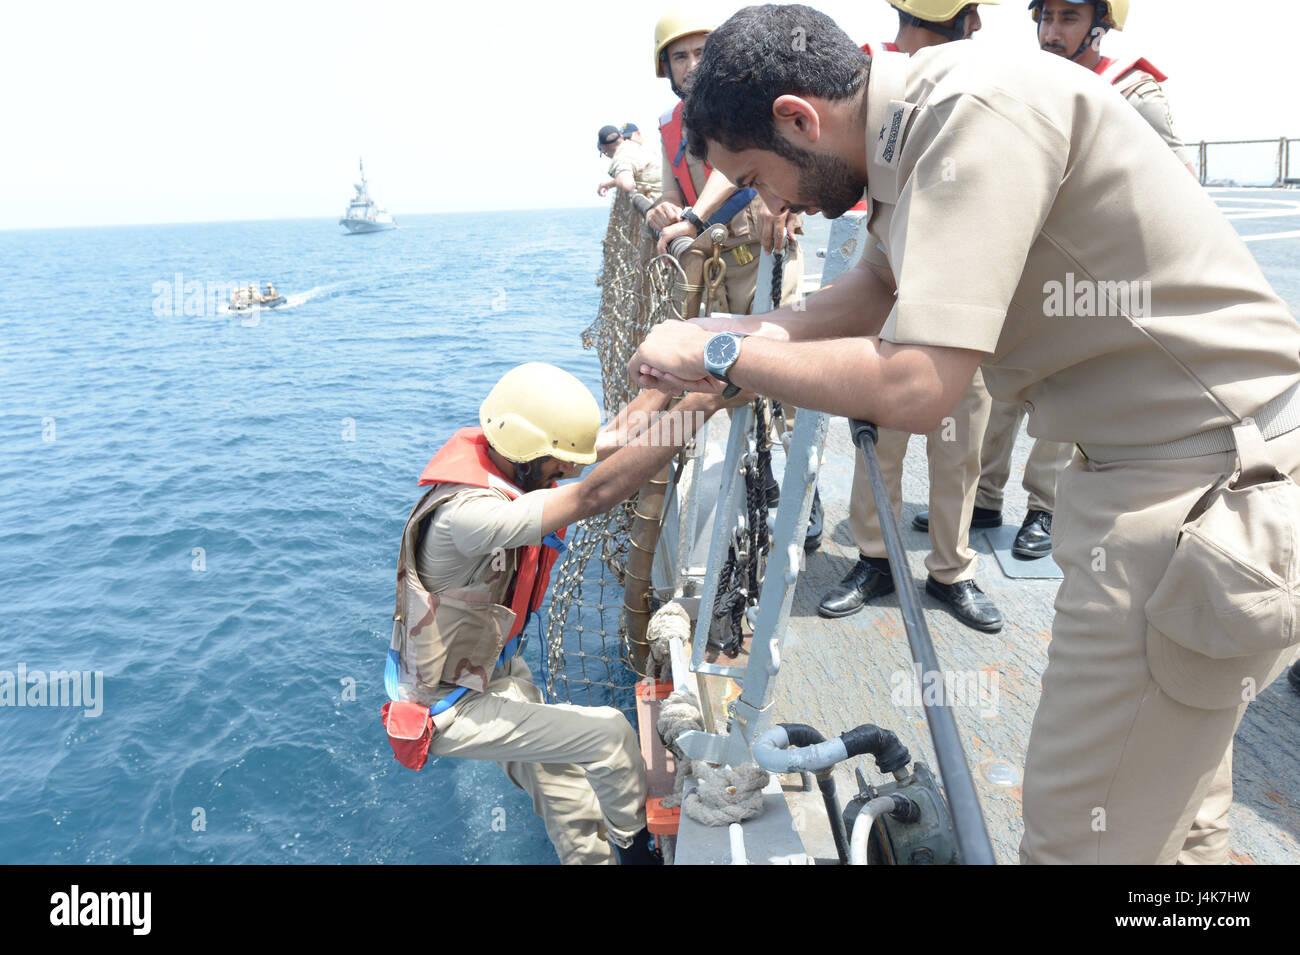 {170503-N-VC432-0139} ARABIAN SEA, Saudi Arabia (May 03, 2017) - A Royal Saudi Navy visit, board, search and seizure Stock Photo